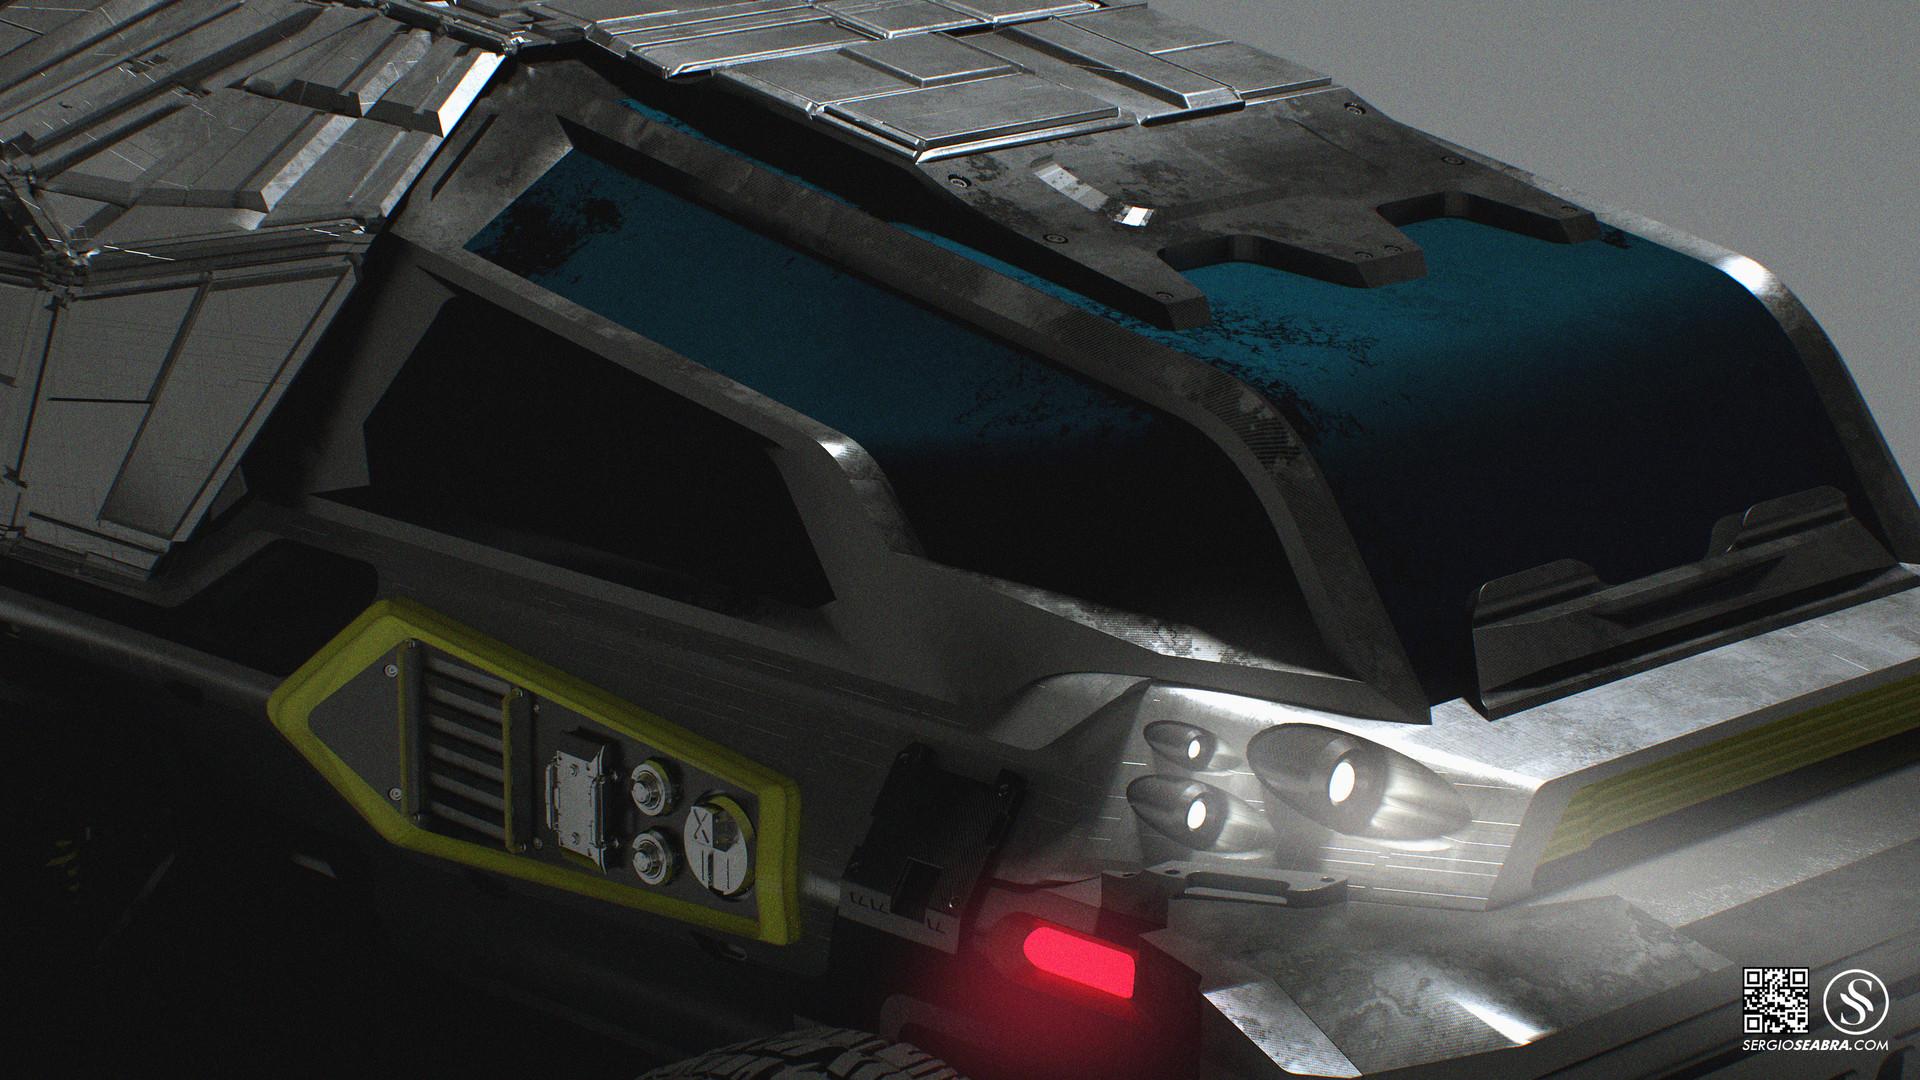 Sergio seabra 201810 veh mars rover layout6 ss